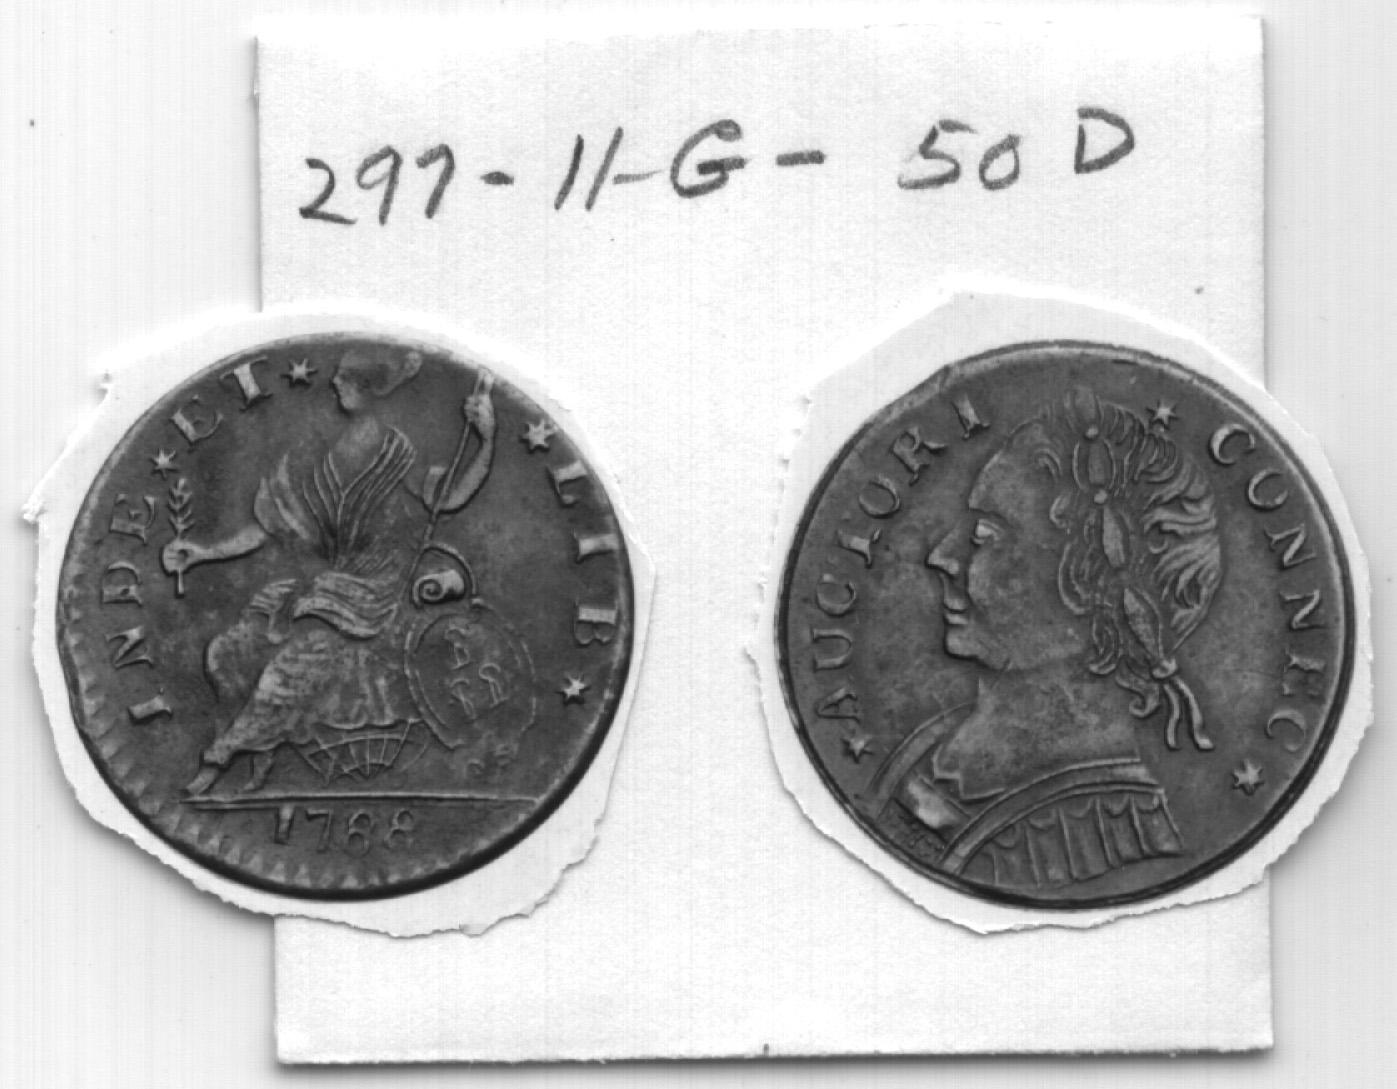 [img width=628 height=489]http://www.coins.nd.edu/EAC-Conn.Lots.1-553/297.JPG[/img]